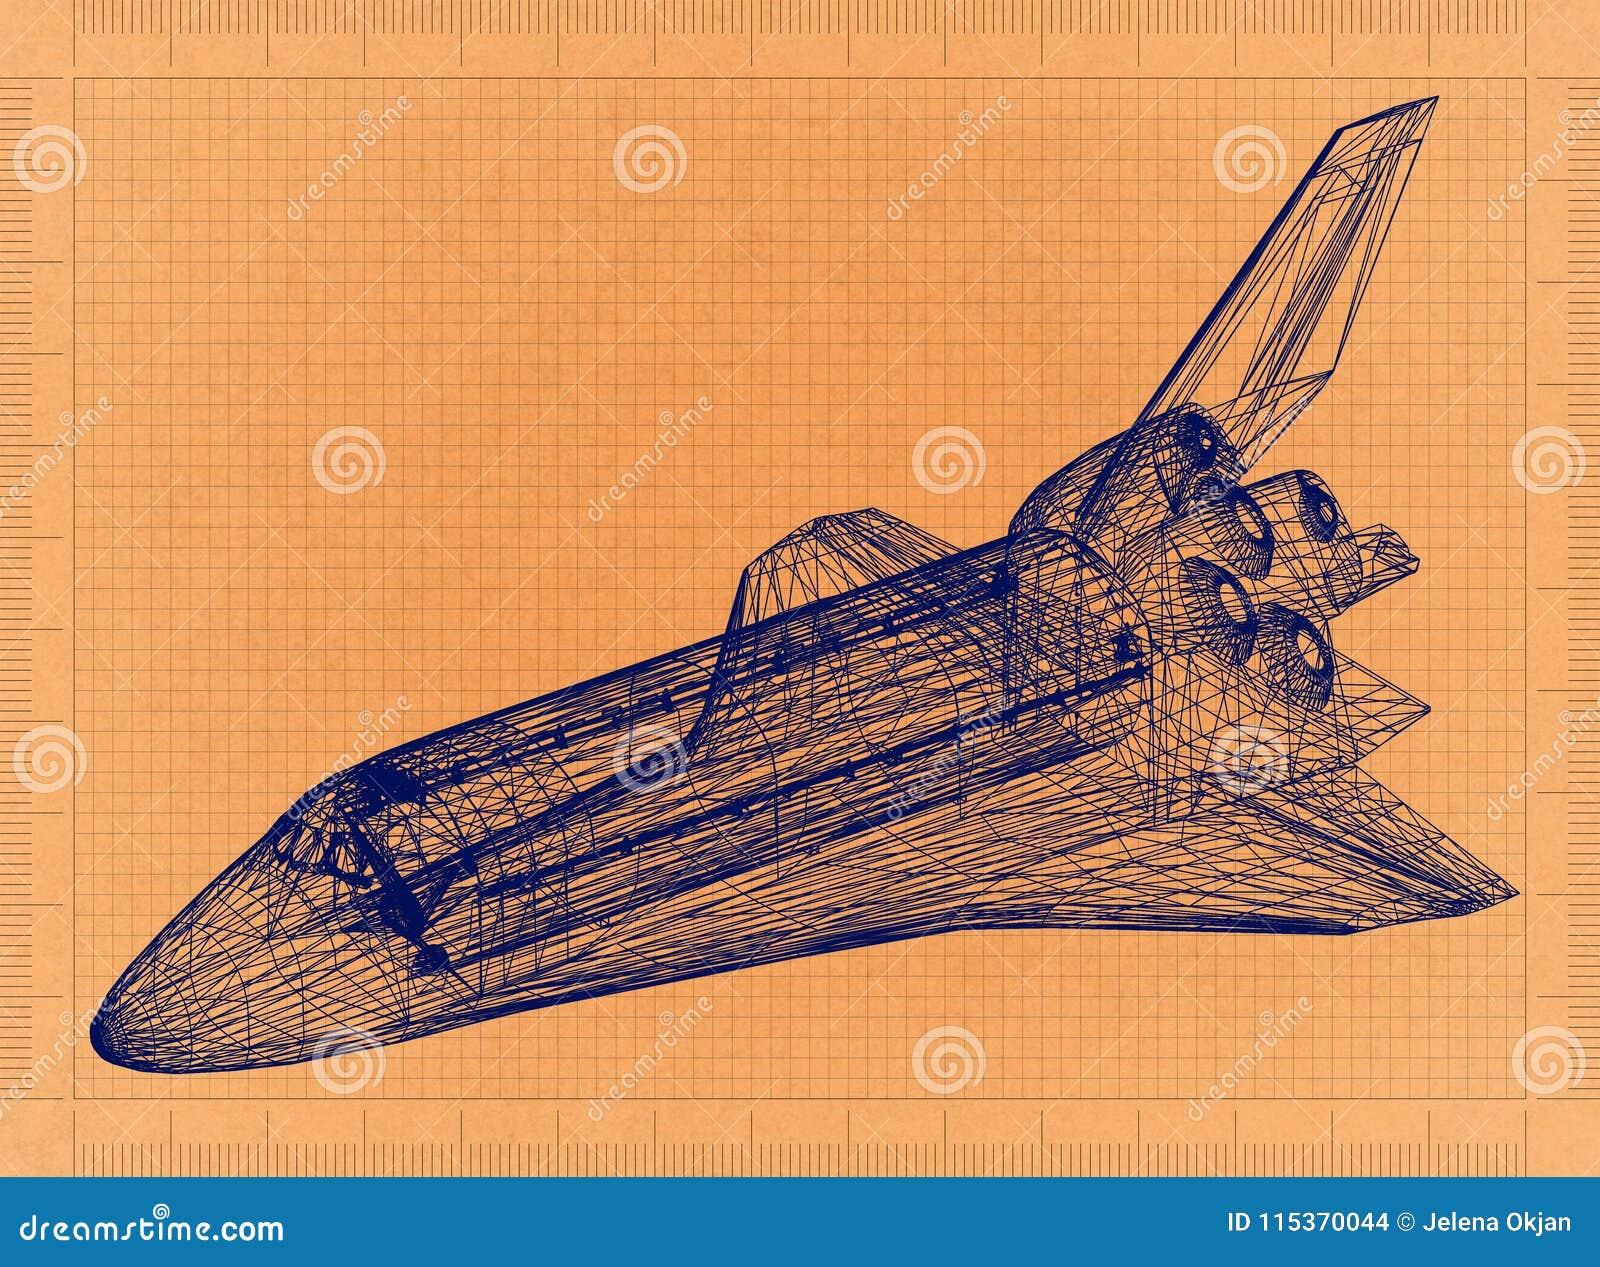 Space Shuttle - Retro Blueprint